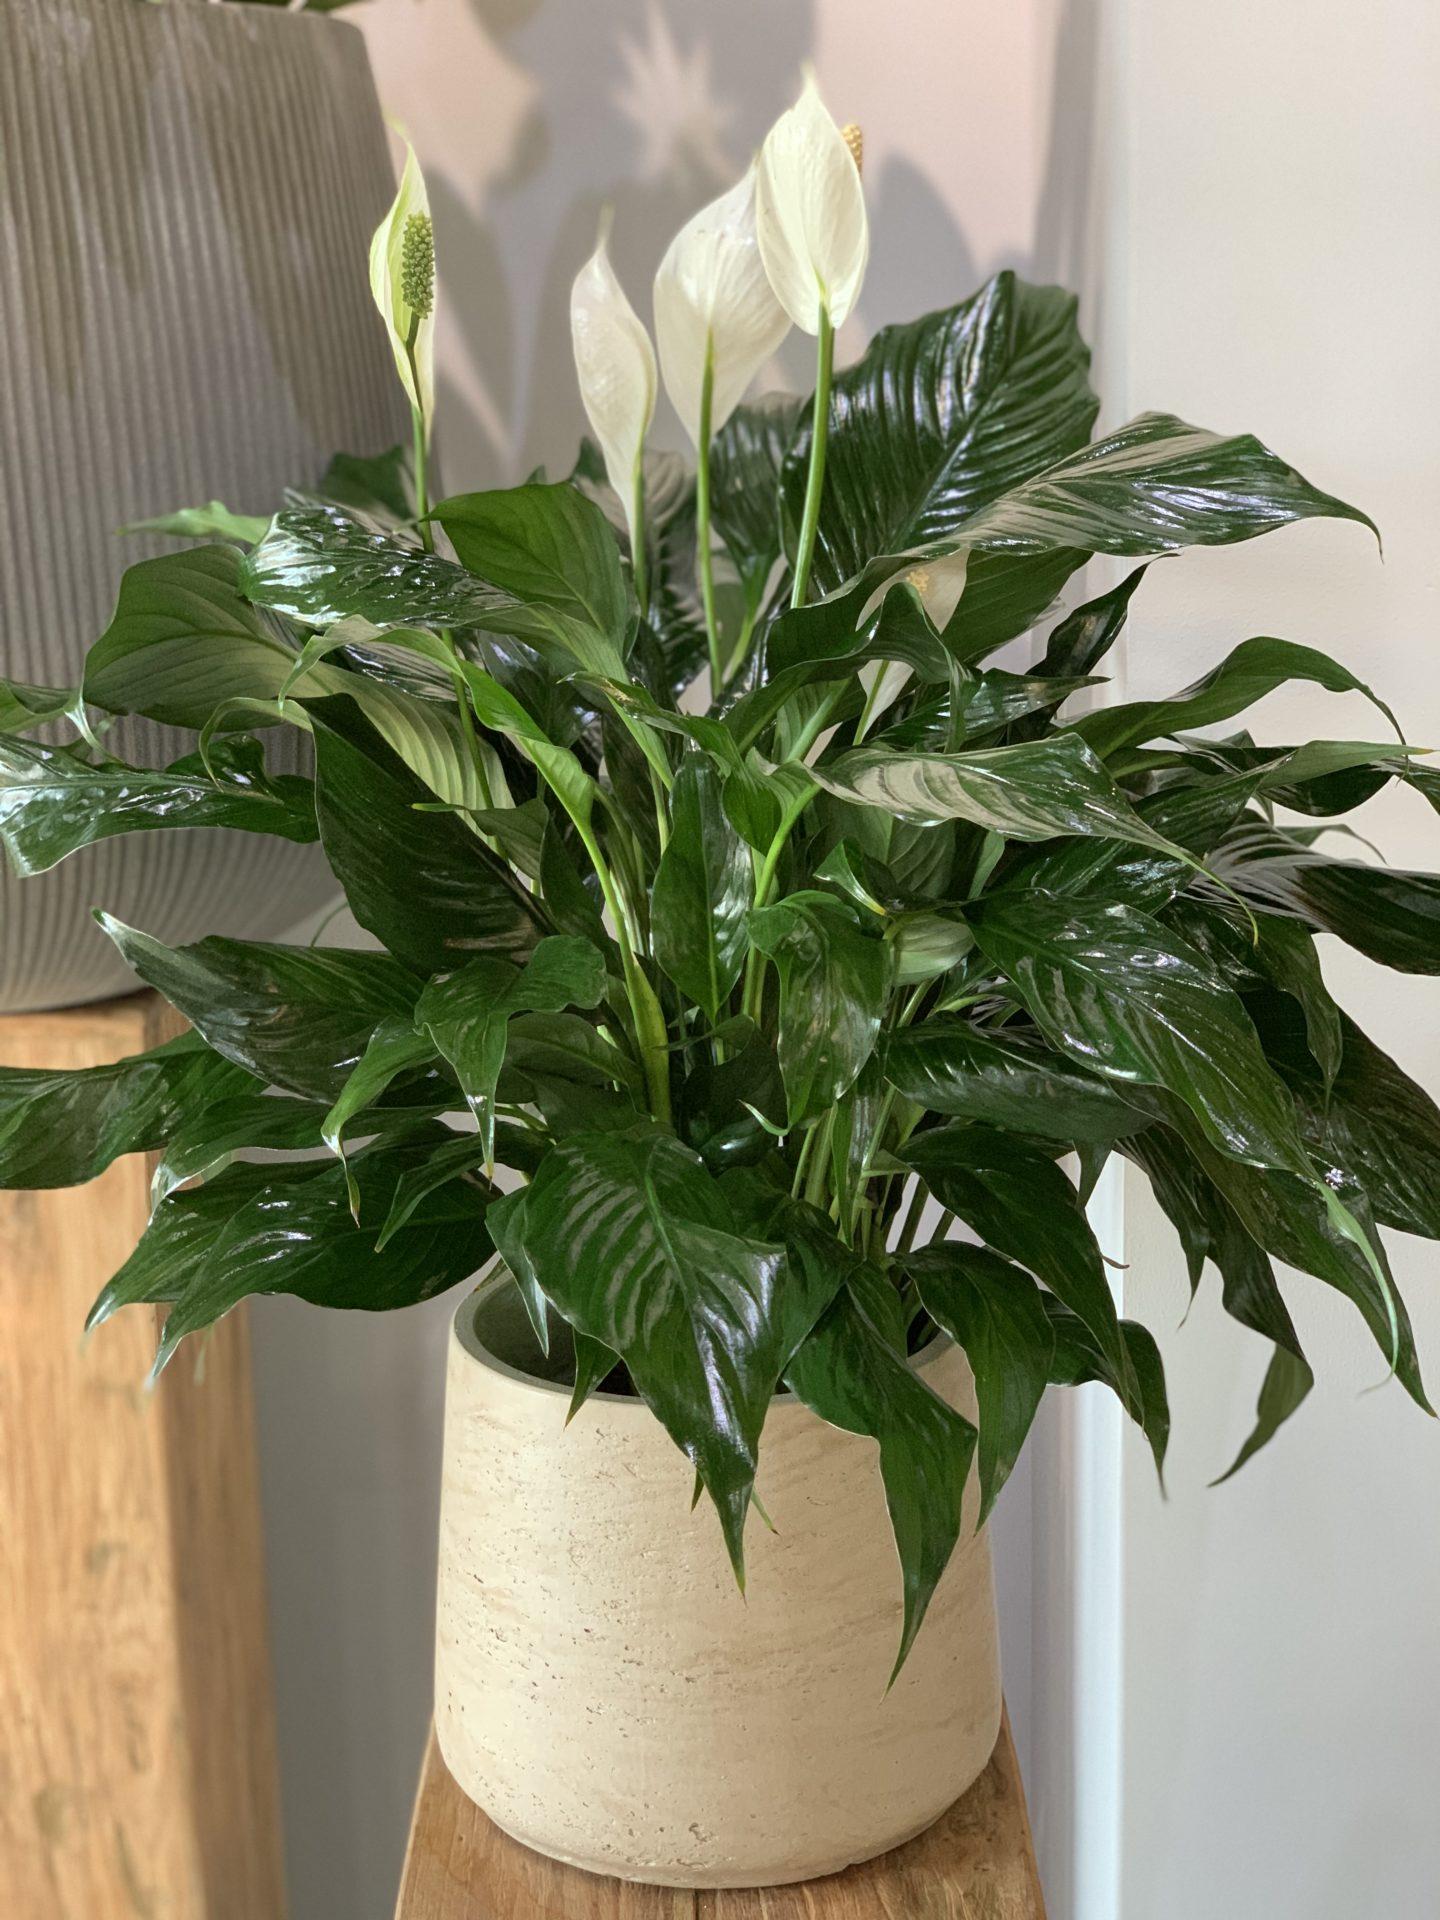 white and green leaves weed, epipremnum pothos house plant, potted white azalea plant, serene peace plant, white calla lily plants, on white and green leaves house plant